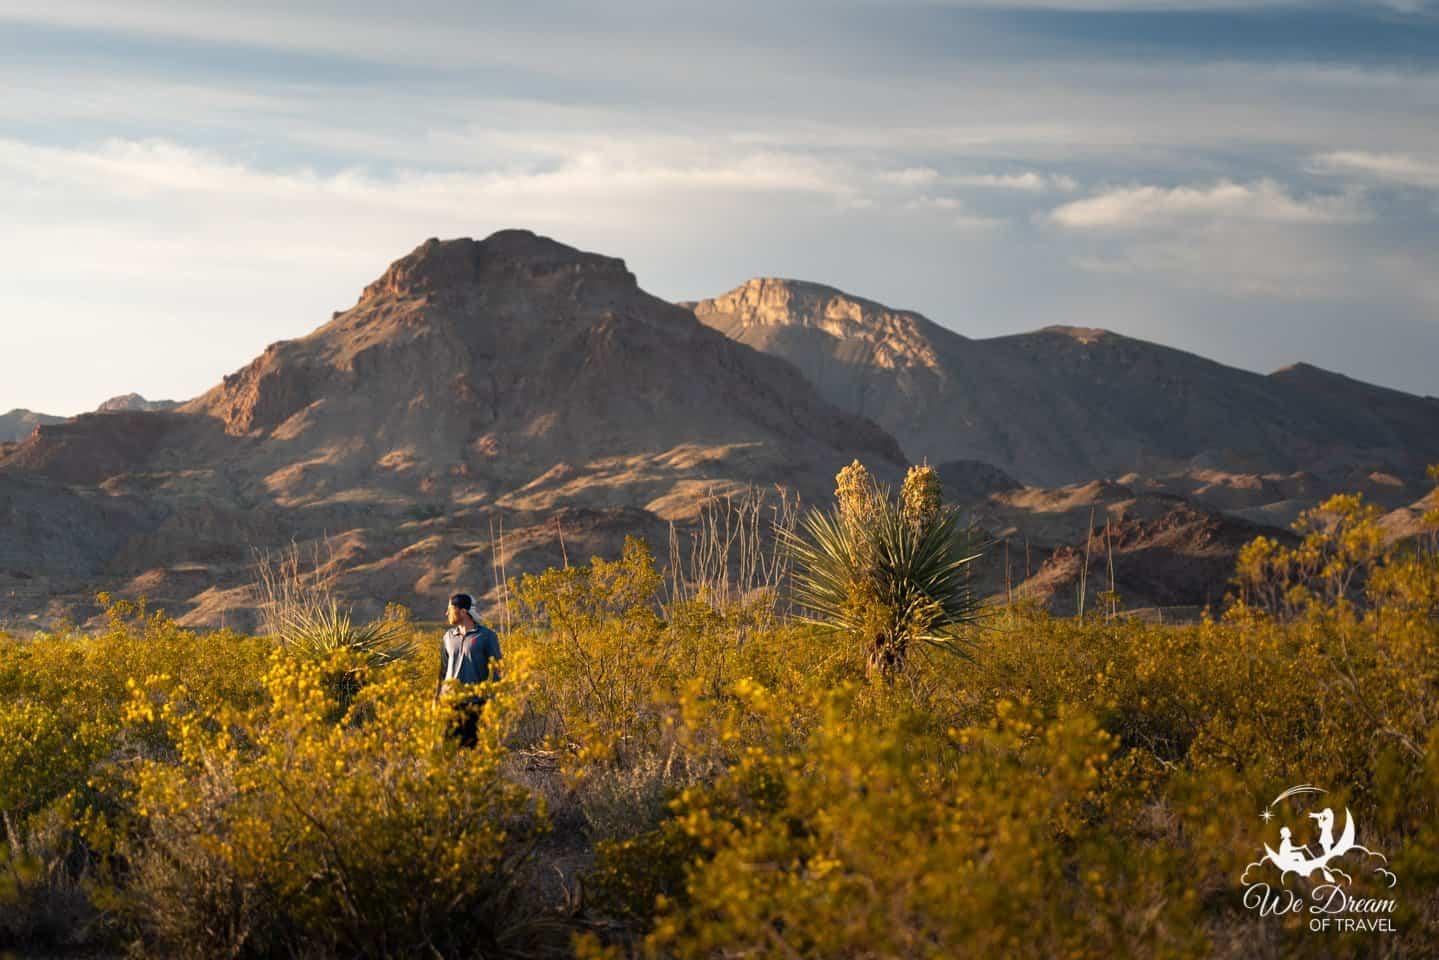 Enjoying a golden moment somewhere in the beautiful desert.